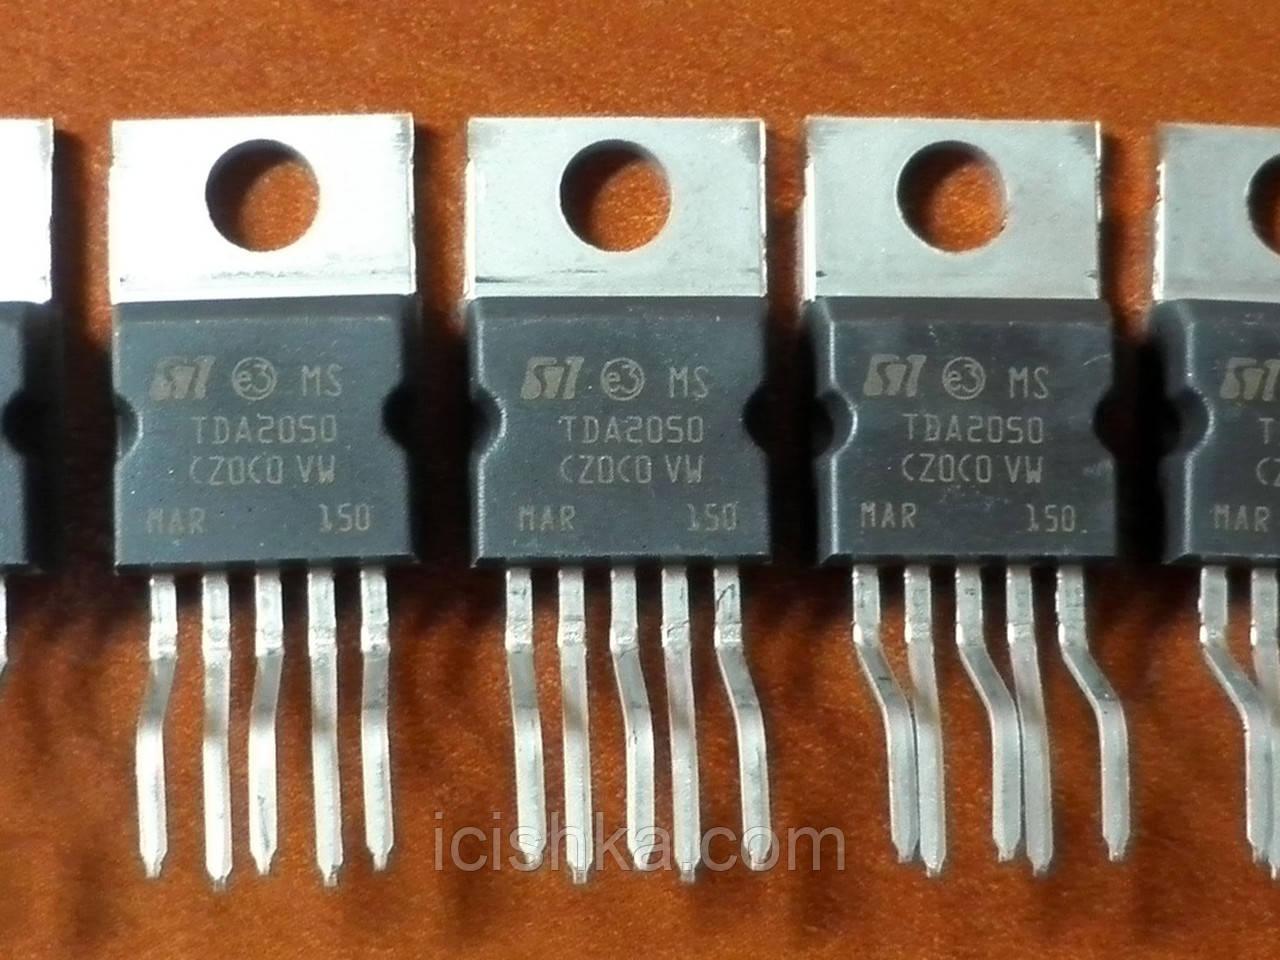 Tda2050a Pentawatt V 32w 850 Hi Fi Audio Amplifier With Tda2050 Icishka